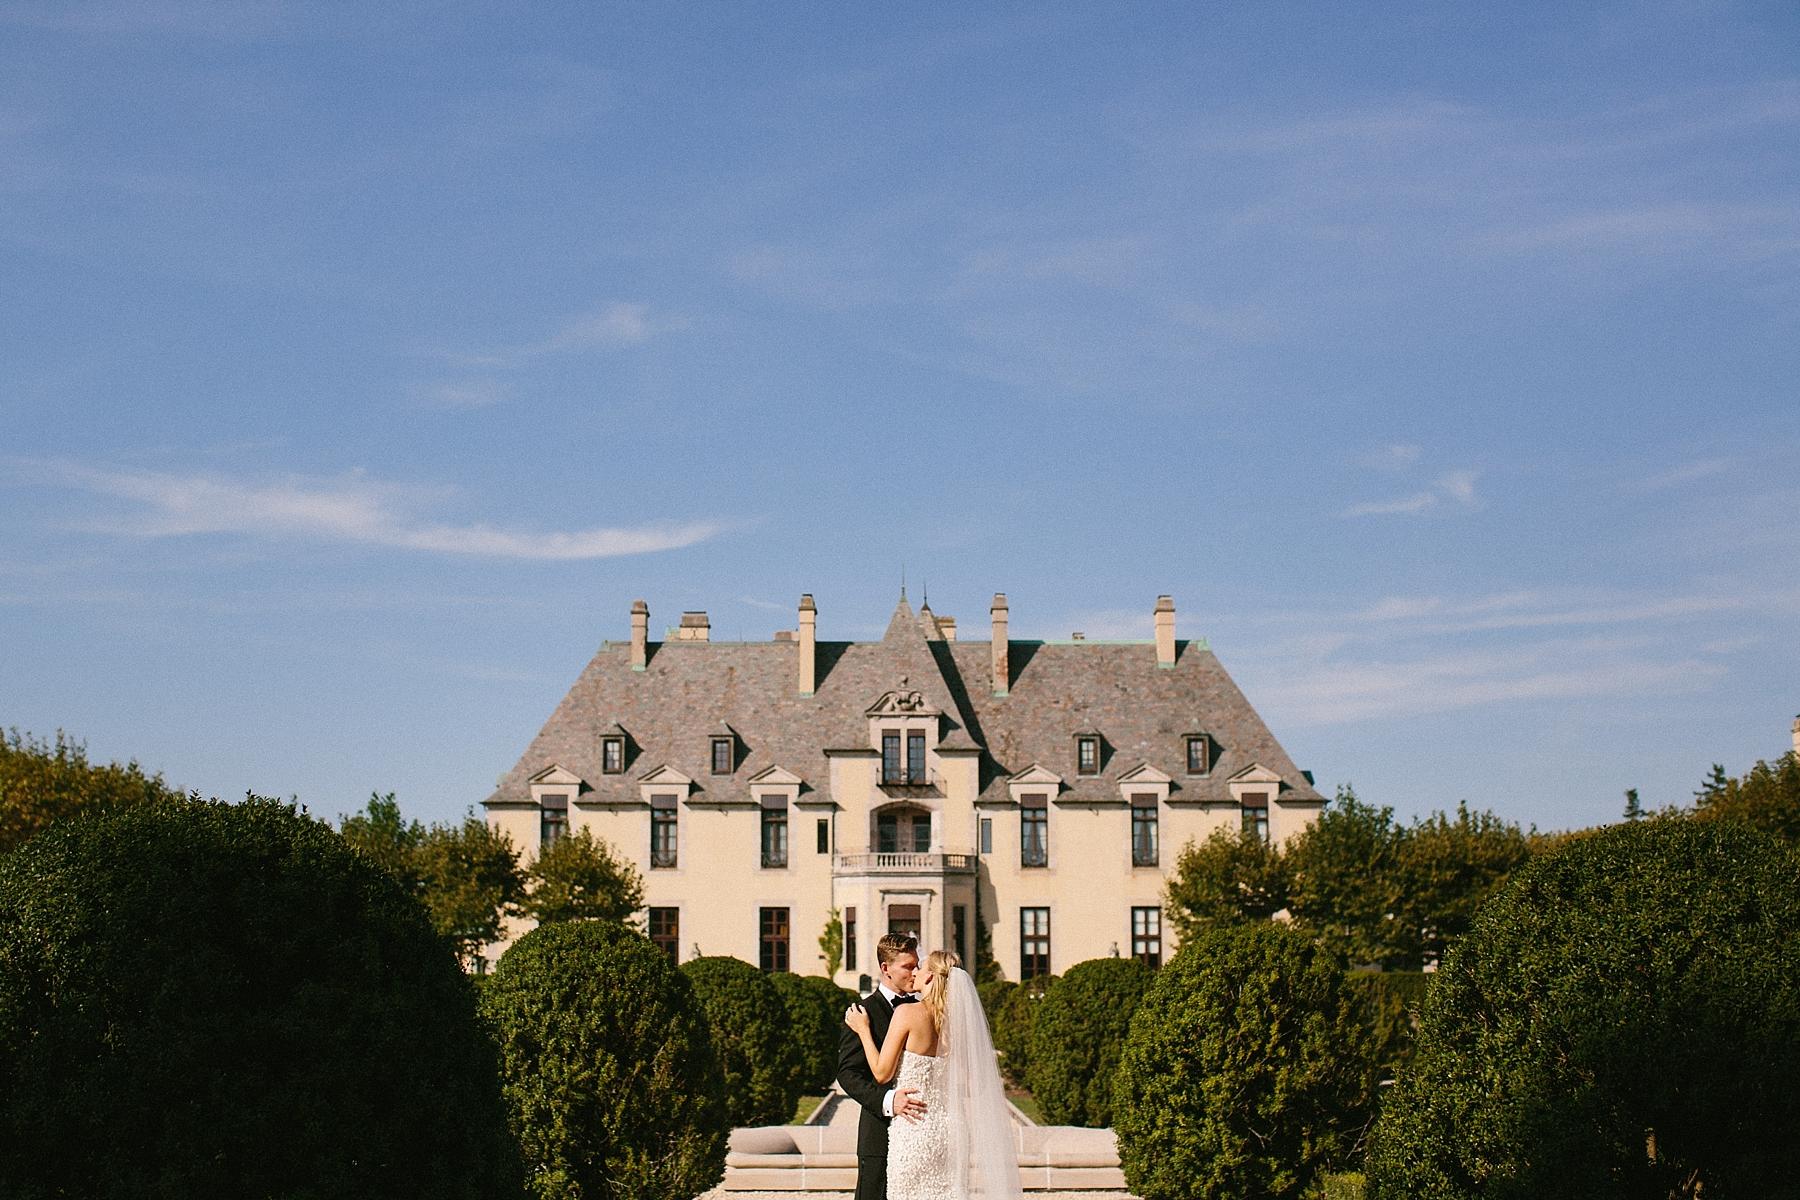 oheka-castle-wedding-nyc-photographer-long-island_0031.jpg